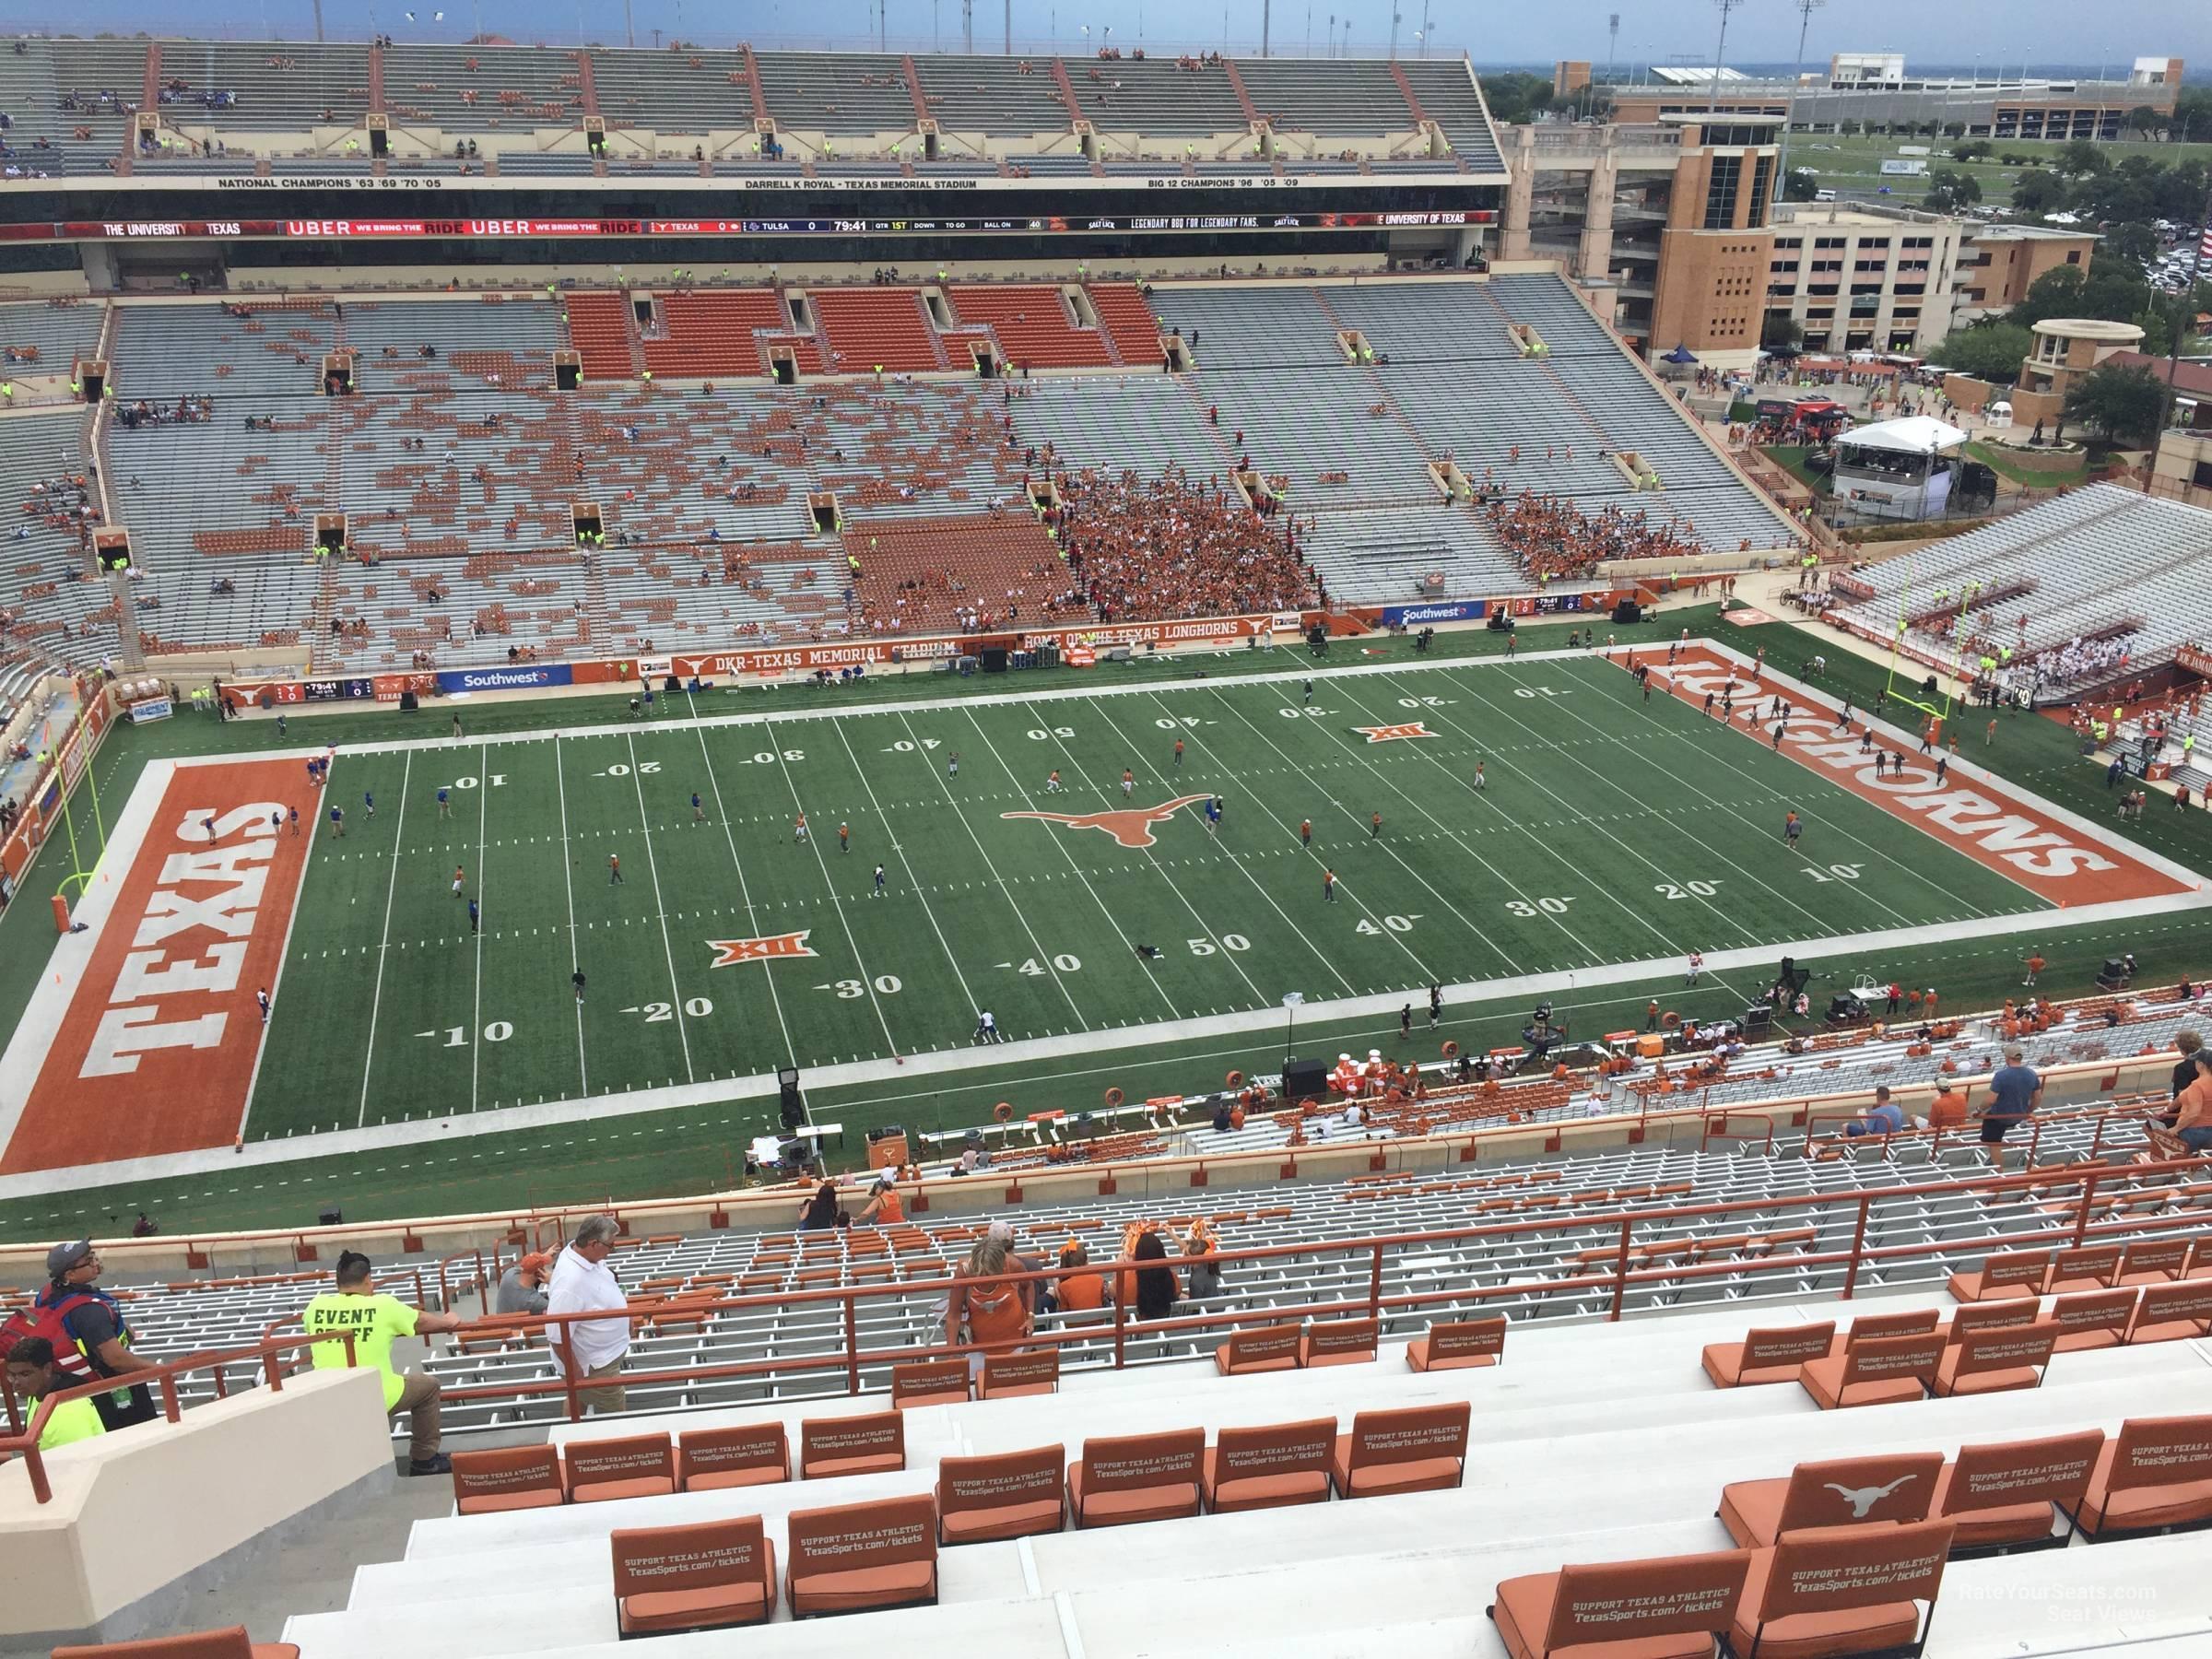 DKR-Texas Memorial Stadium Section 106 - RateYourSeats.com on darrell k royal stadium map, acc stadium map, dkr parking map, dkr stadium-seating chart view, dkr football seating capacity, milan puskar stadium map, ut stadium map, dkr suite map, texas stadium map,